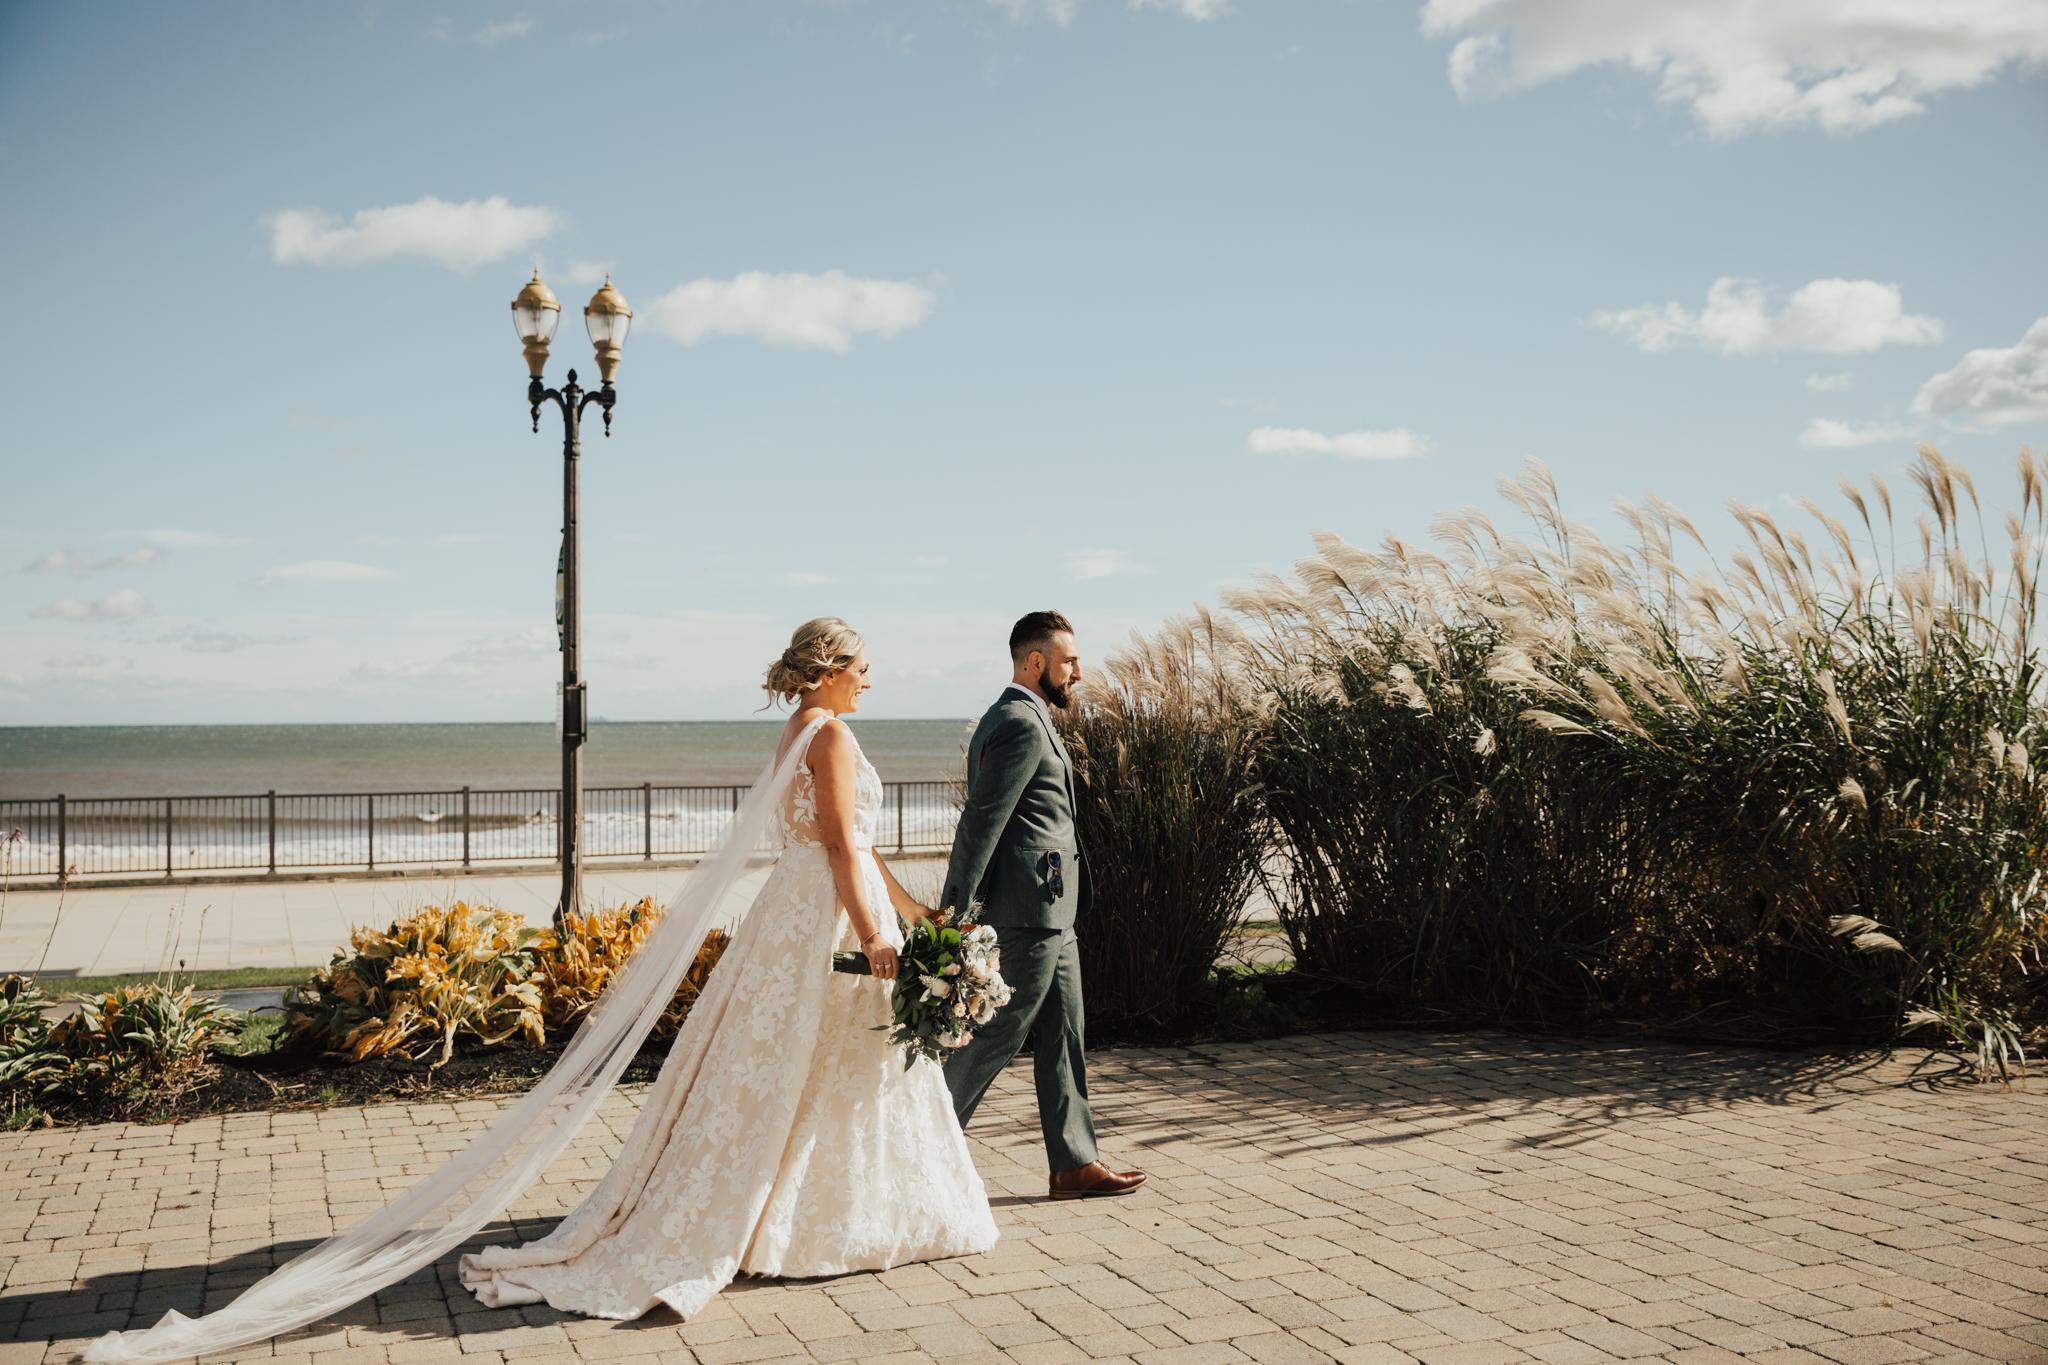 Authentic moments wedding